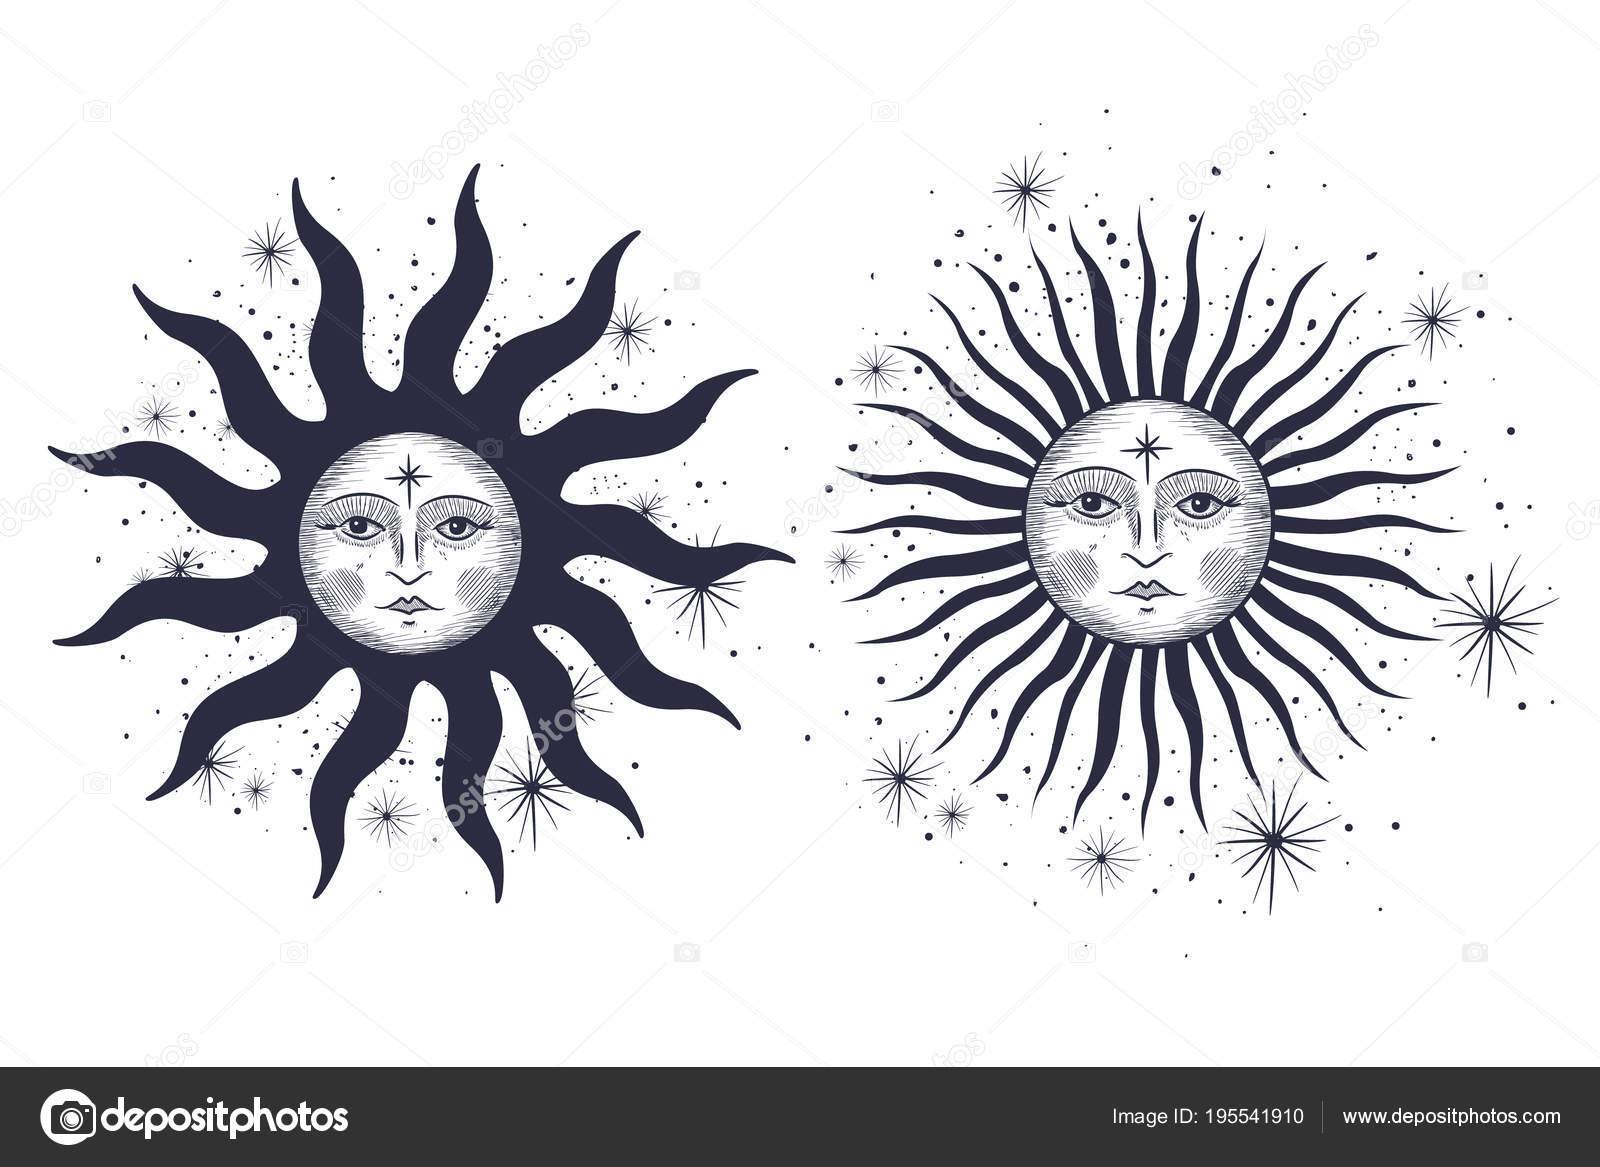 Sun And Moon Designs Tattoos Face Sun Moon Stars Masonic Tattoo Design Shirts Alchemy Akultism Stock Vector C Irkast 195541910